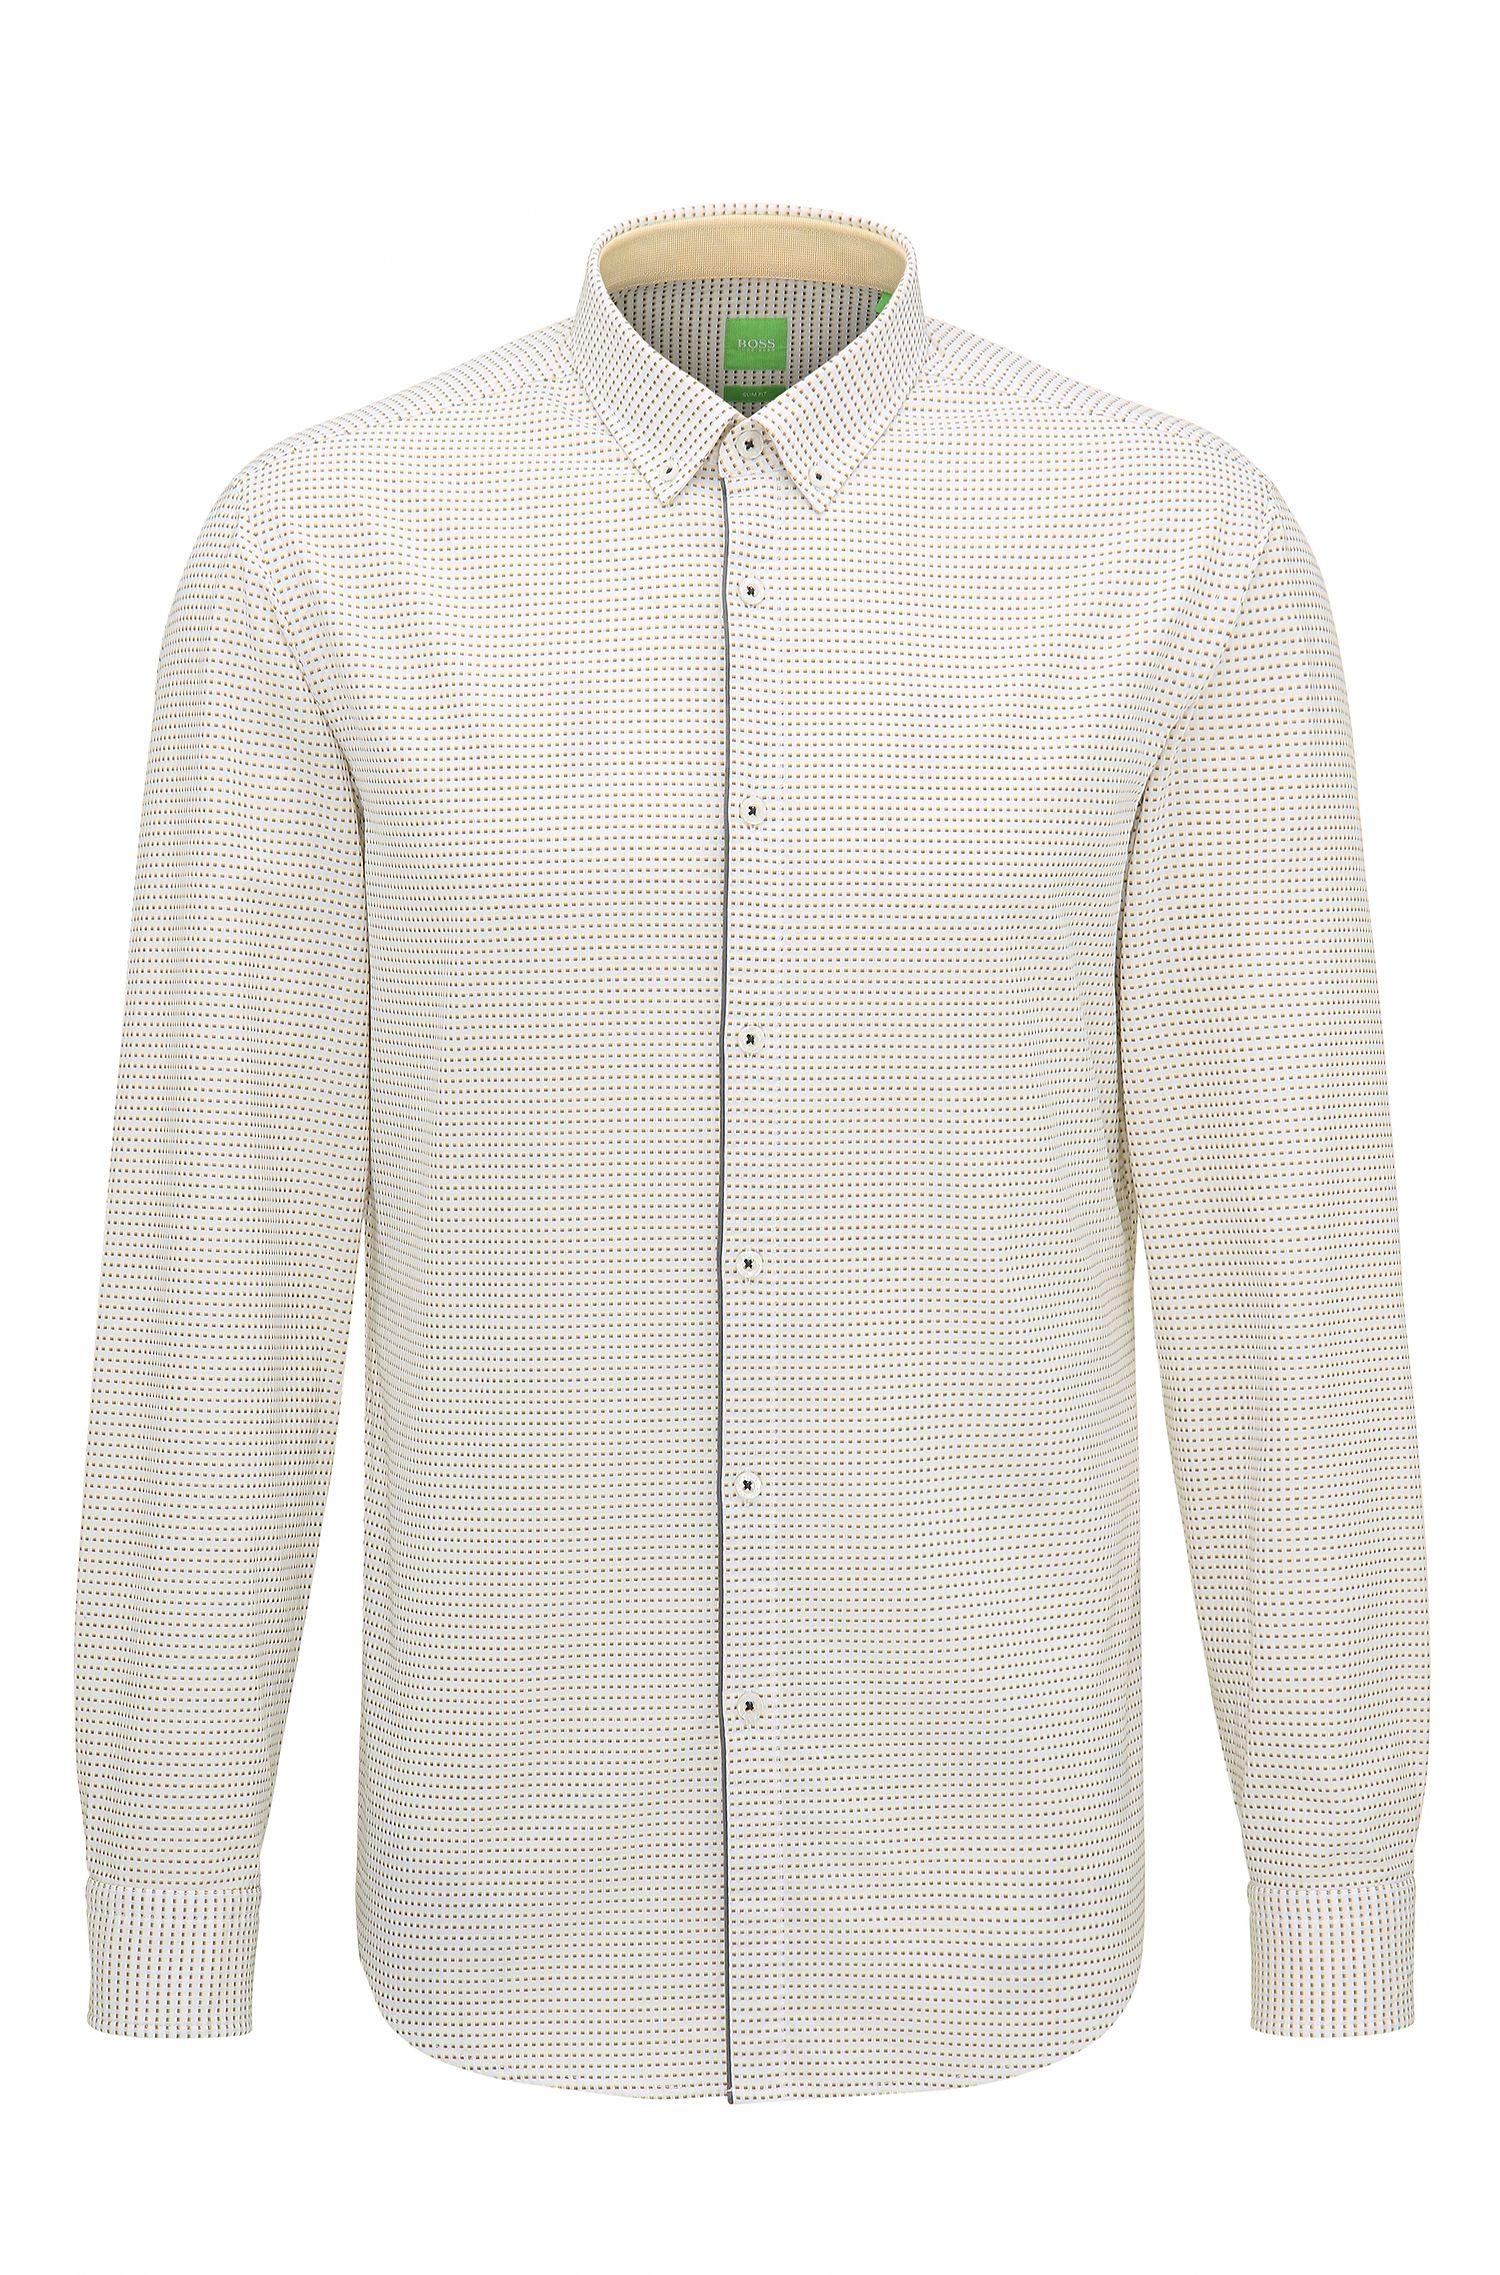 Micro-Square Dot Cotton Button-Down Shirt, Slim Fit | C-Baltero